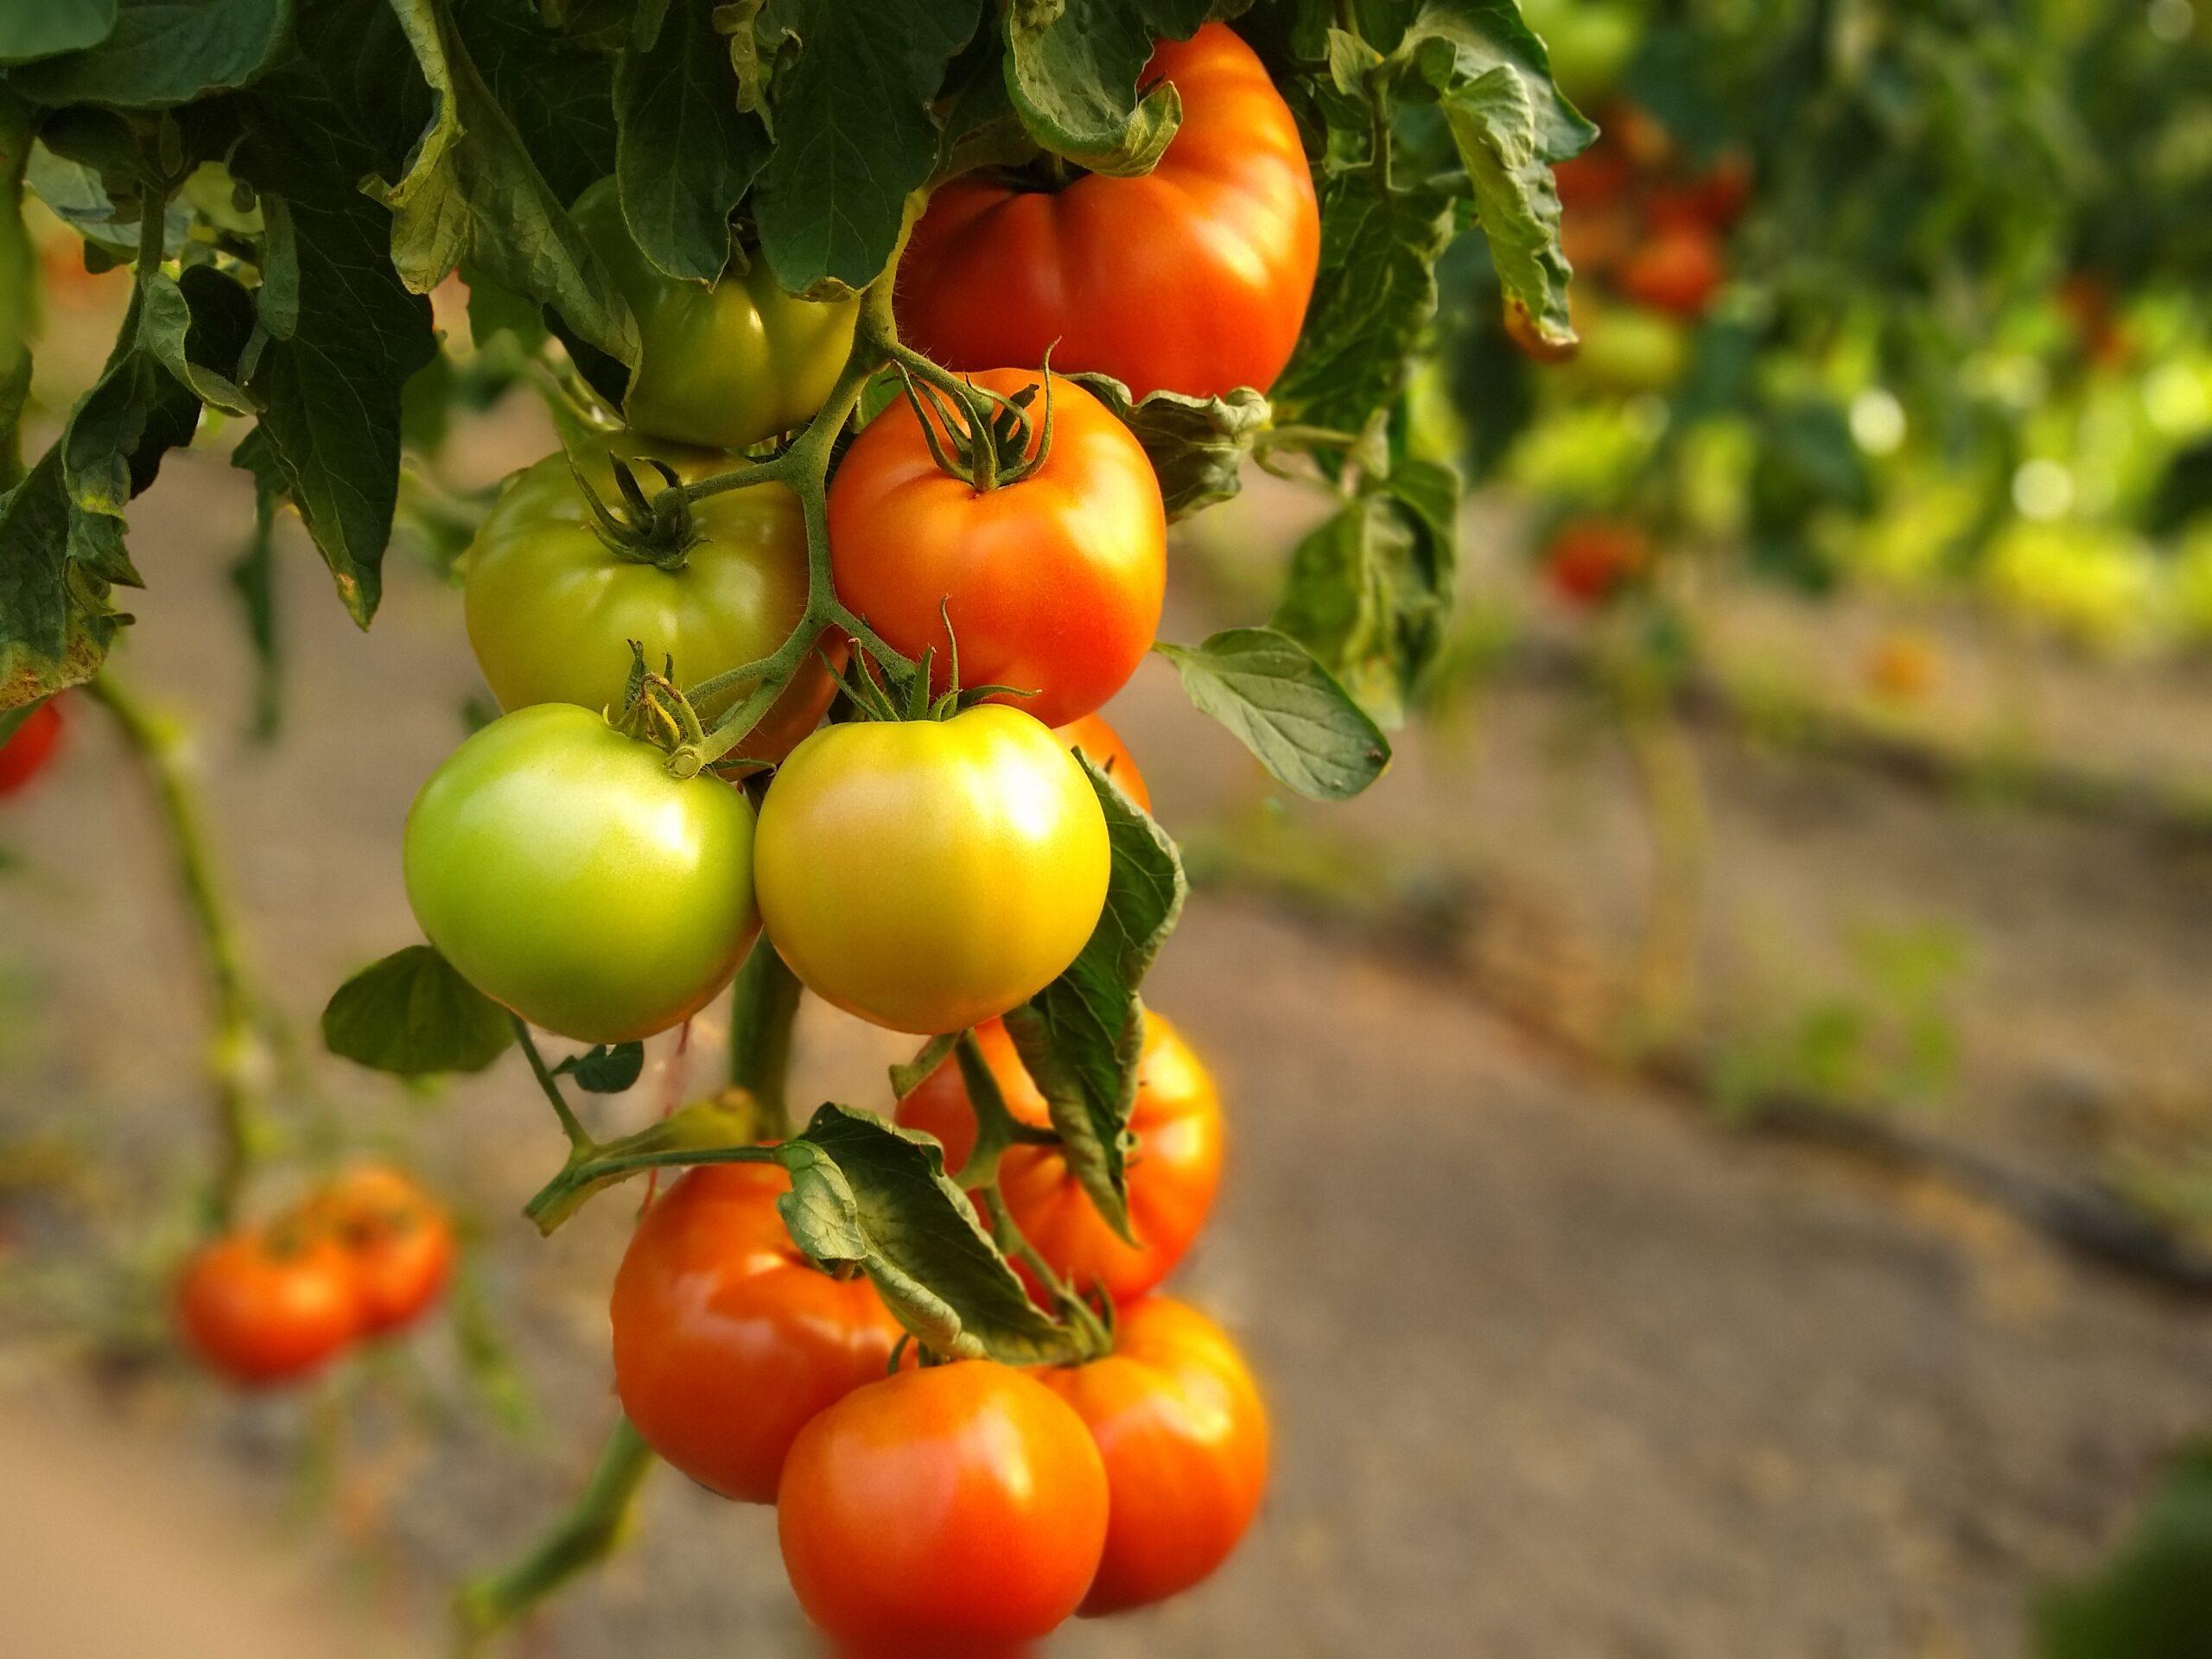 Tomatoes Nistler Farms